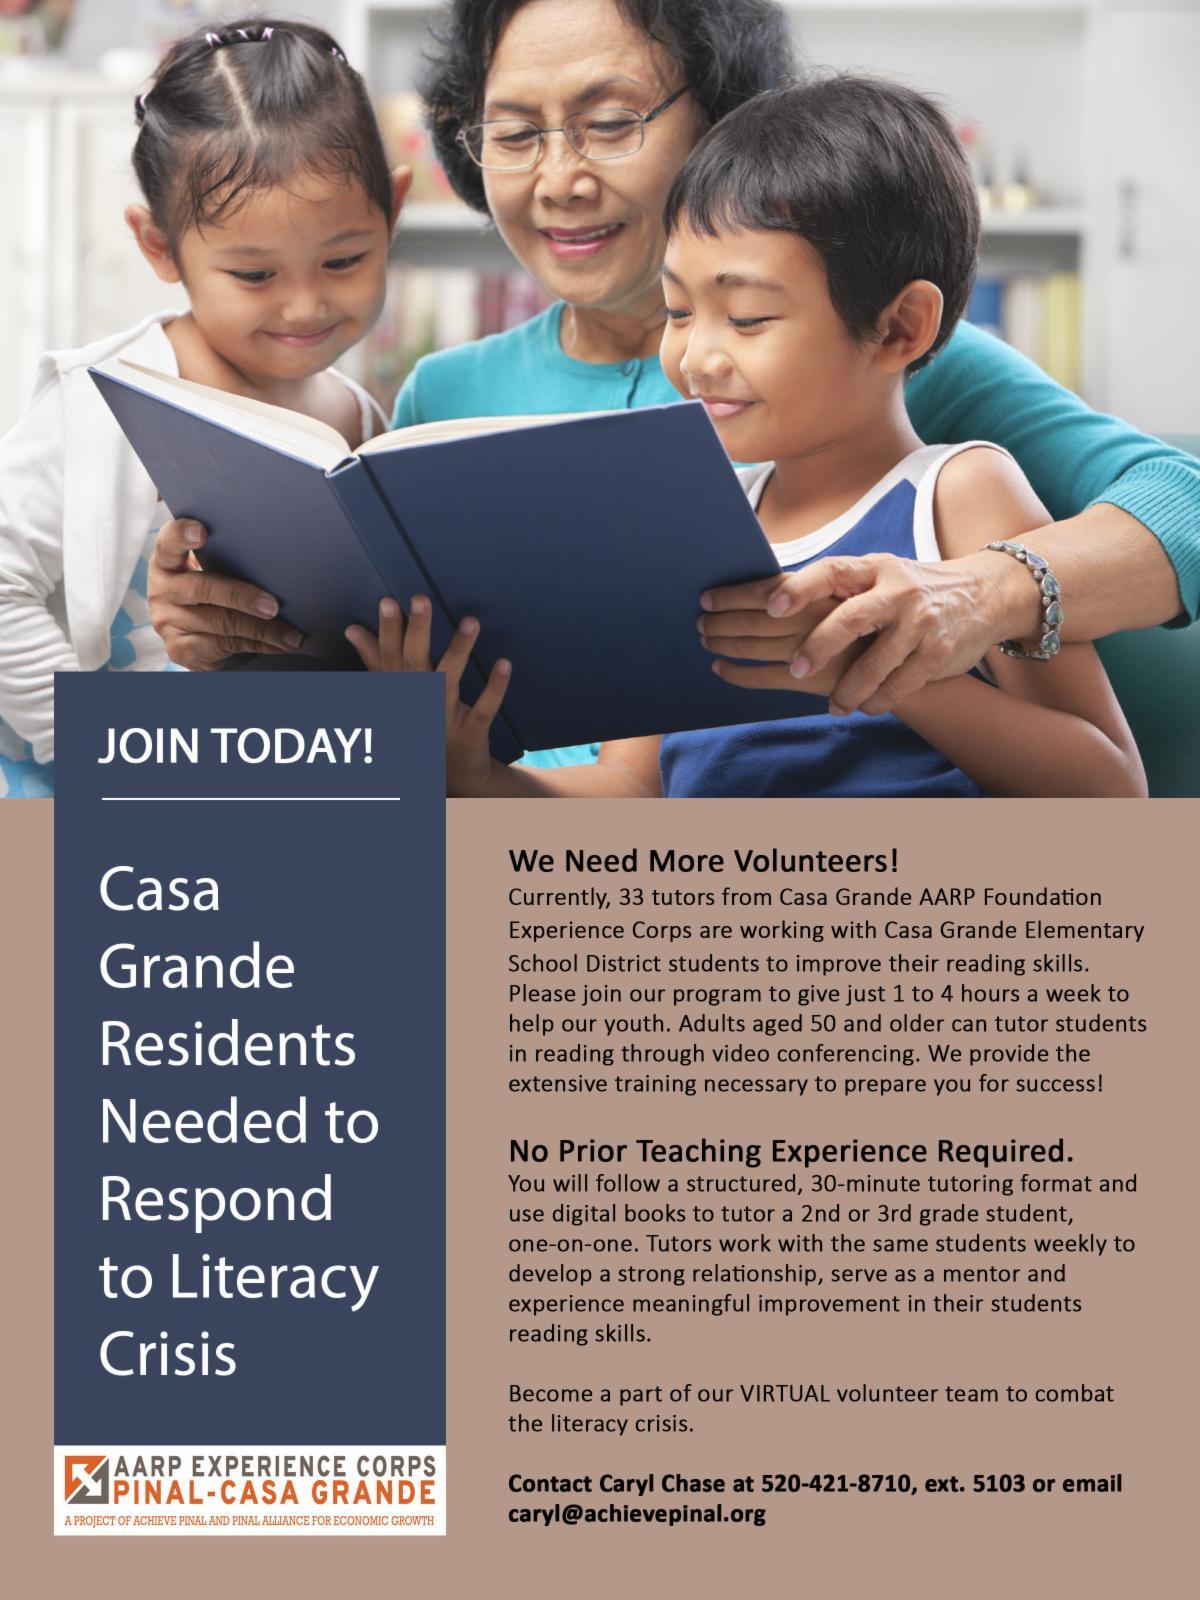 Asian elderly grandma reading with grandchildren